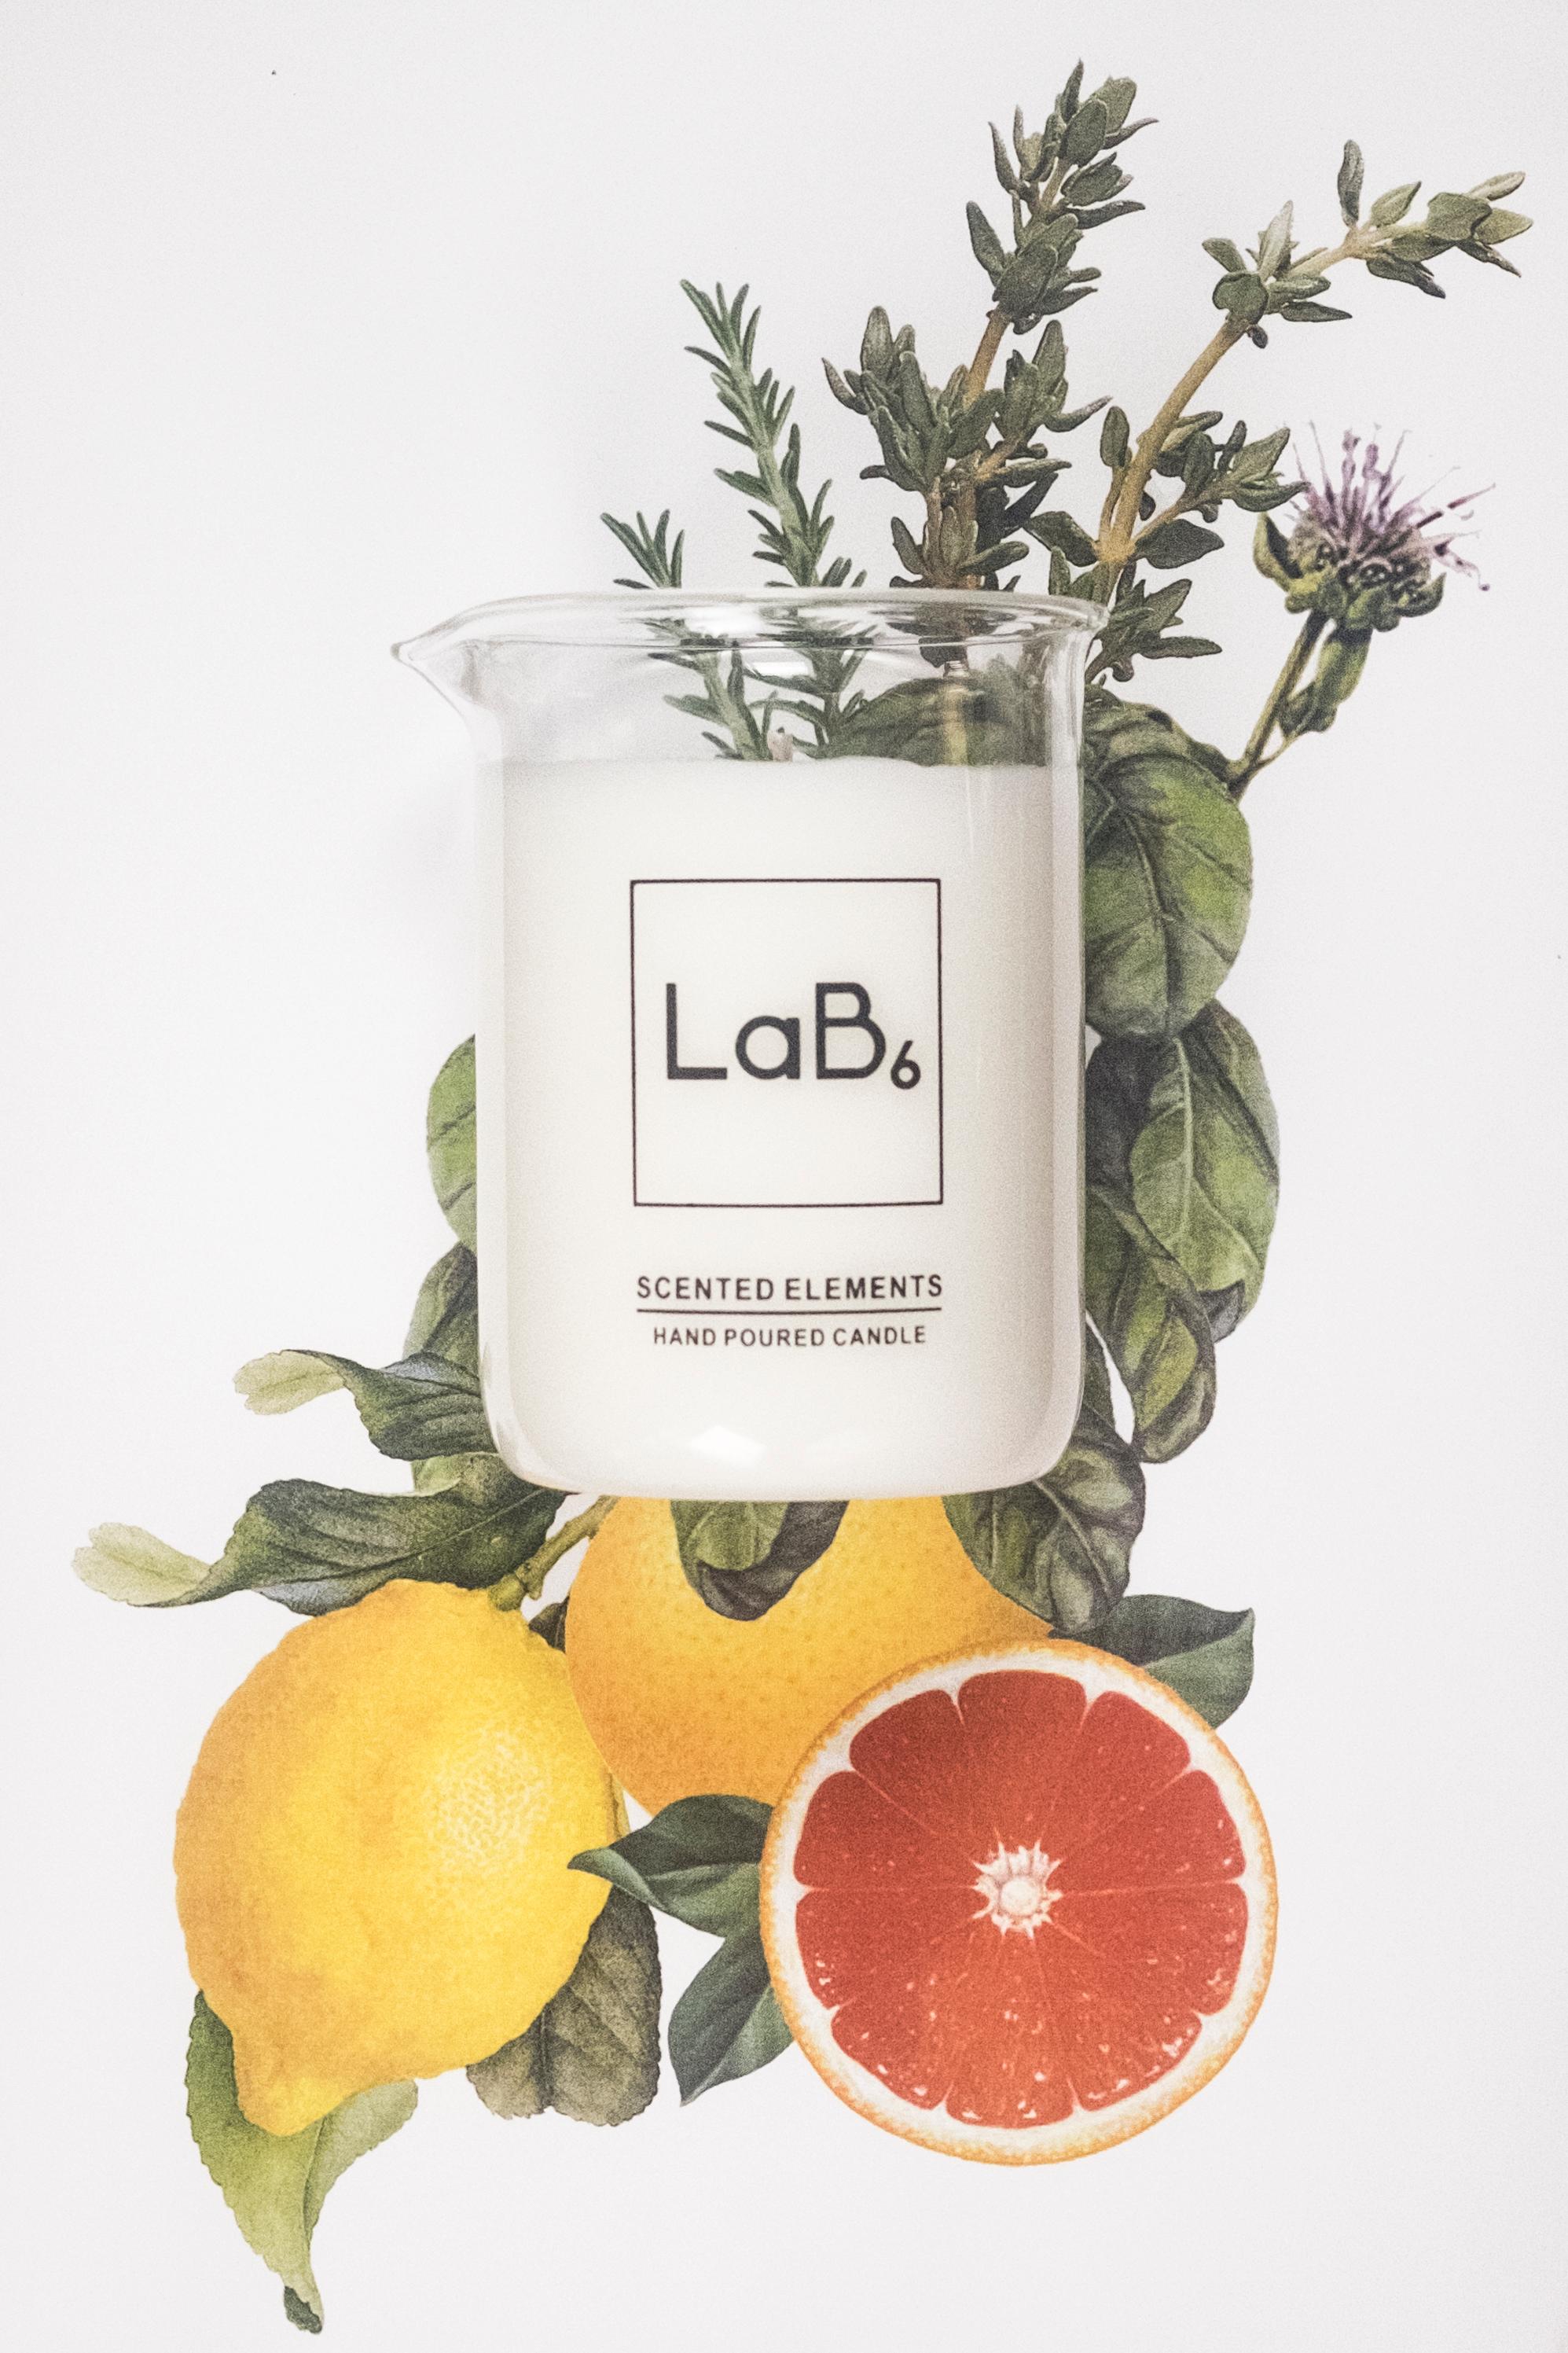 7.01 Sorrel and Lemon Thyme